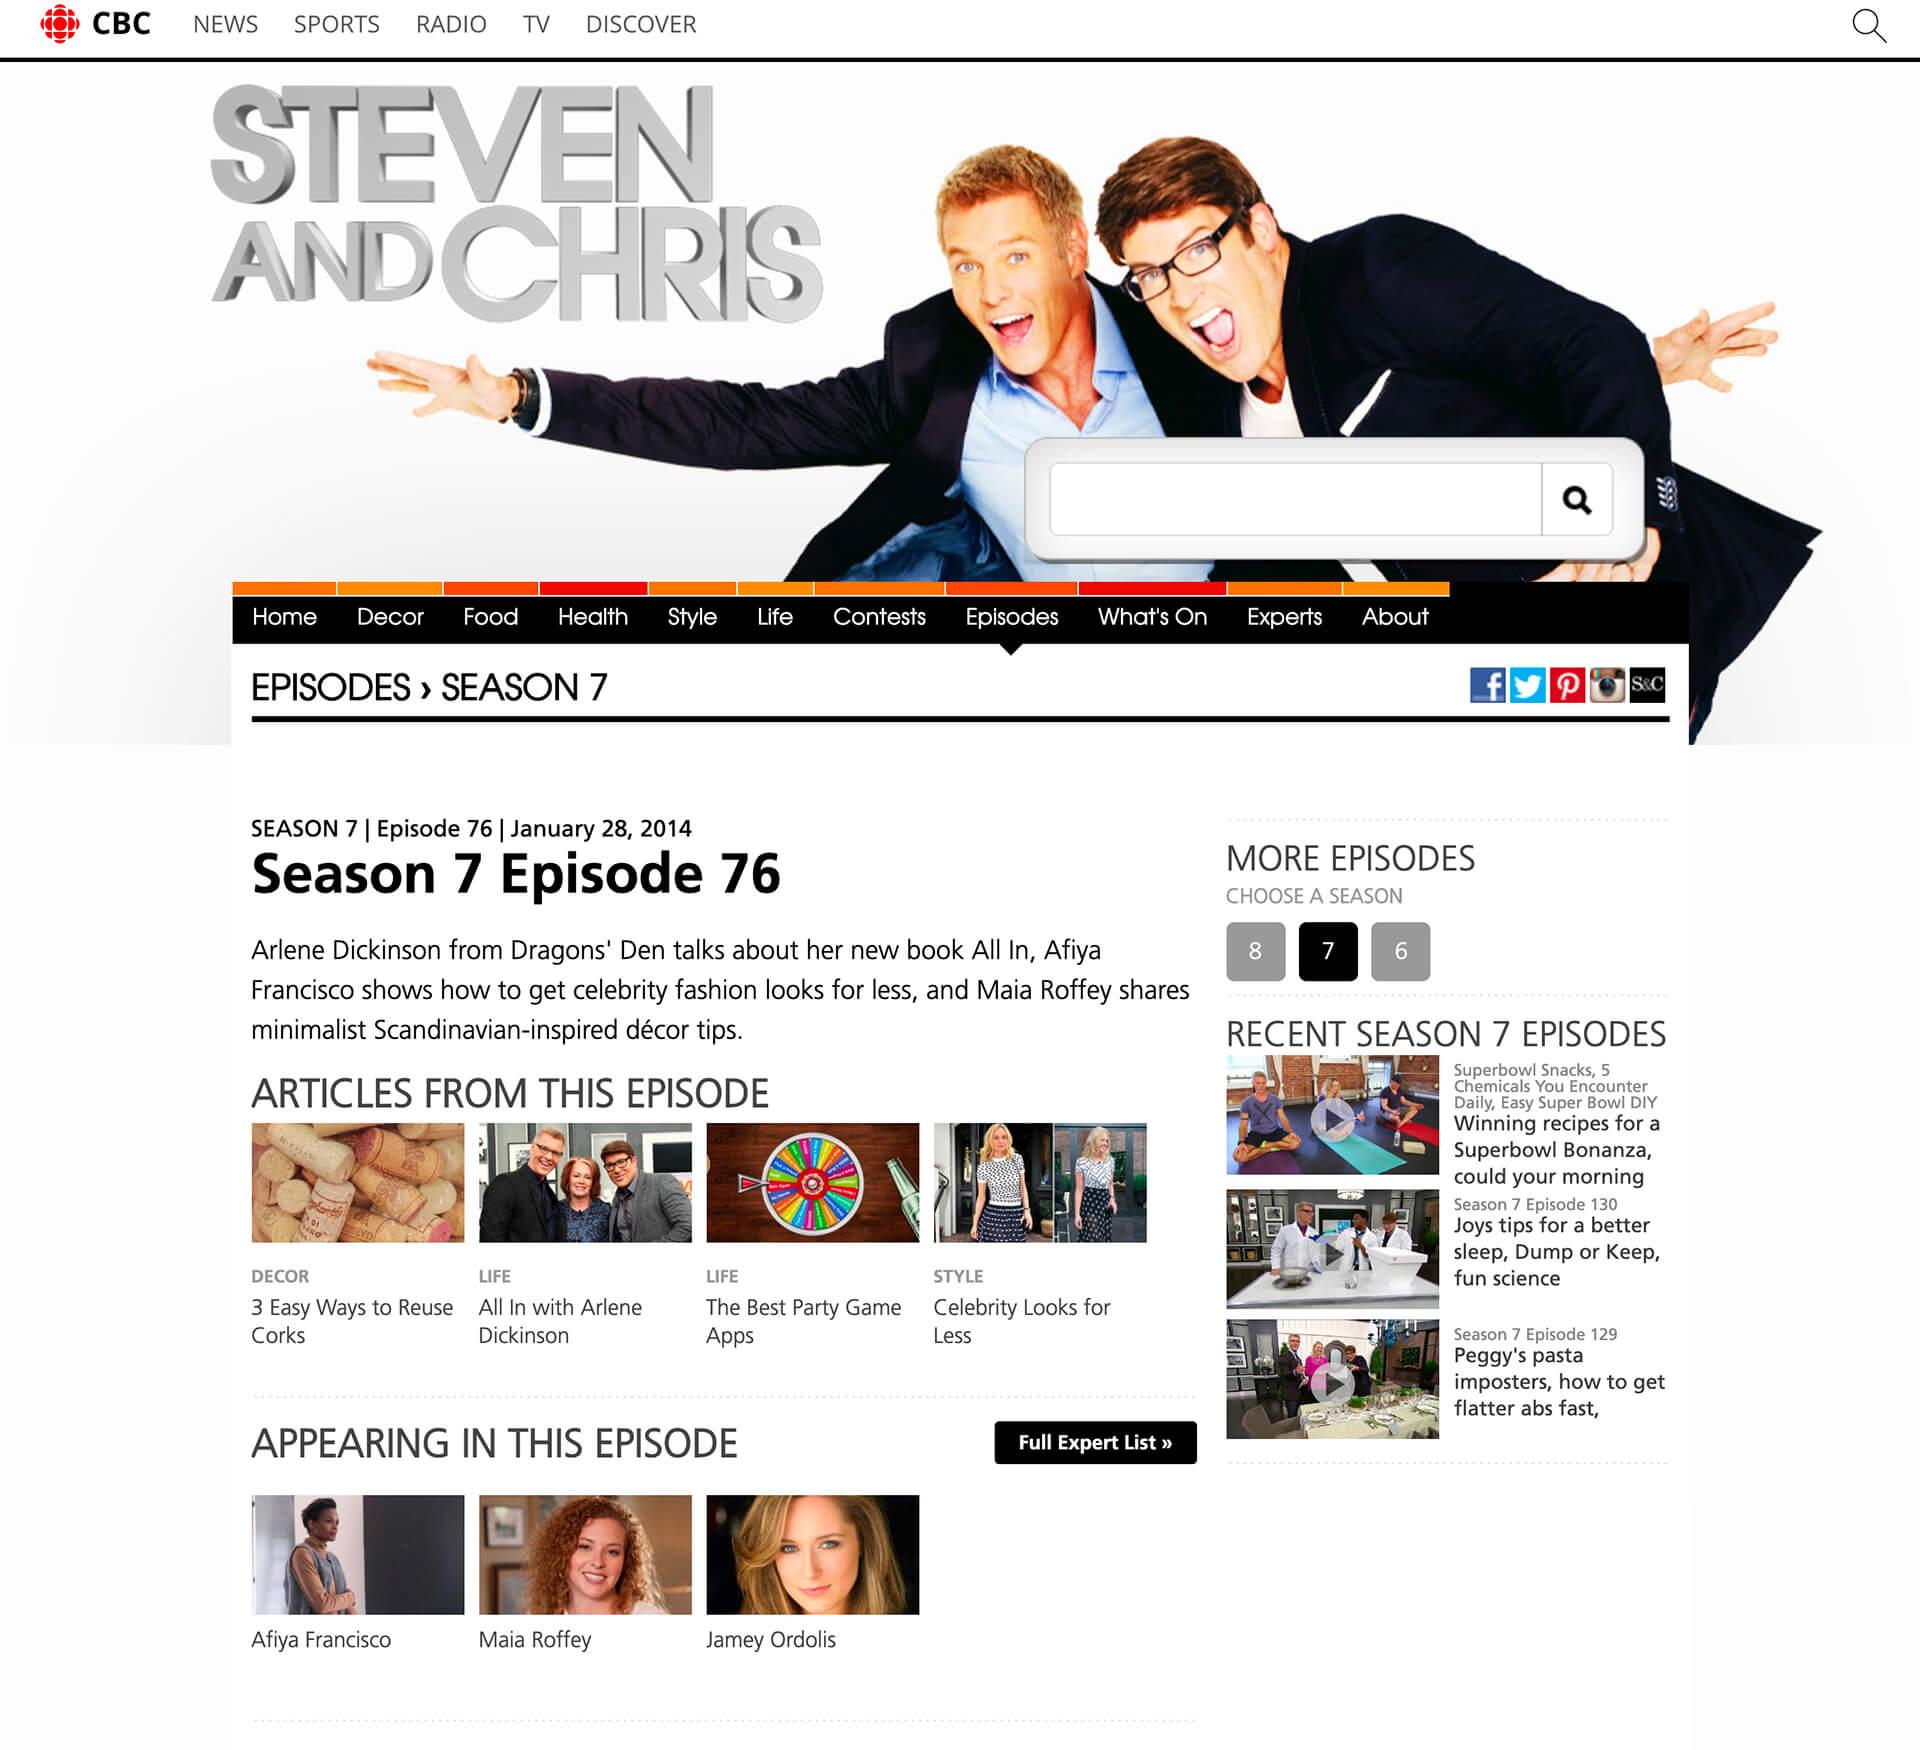 Steven and Chris, Season 7 Episode 75, January 28, 2014